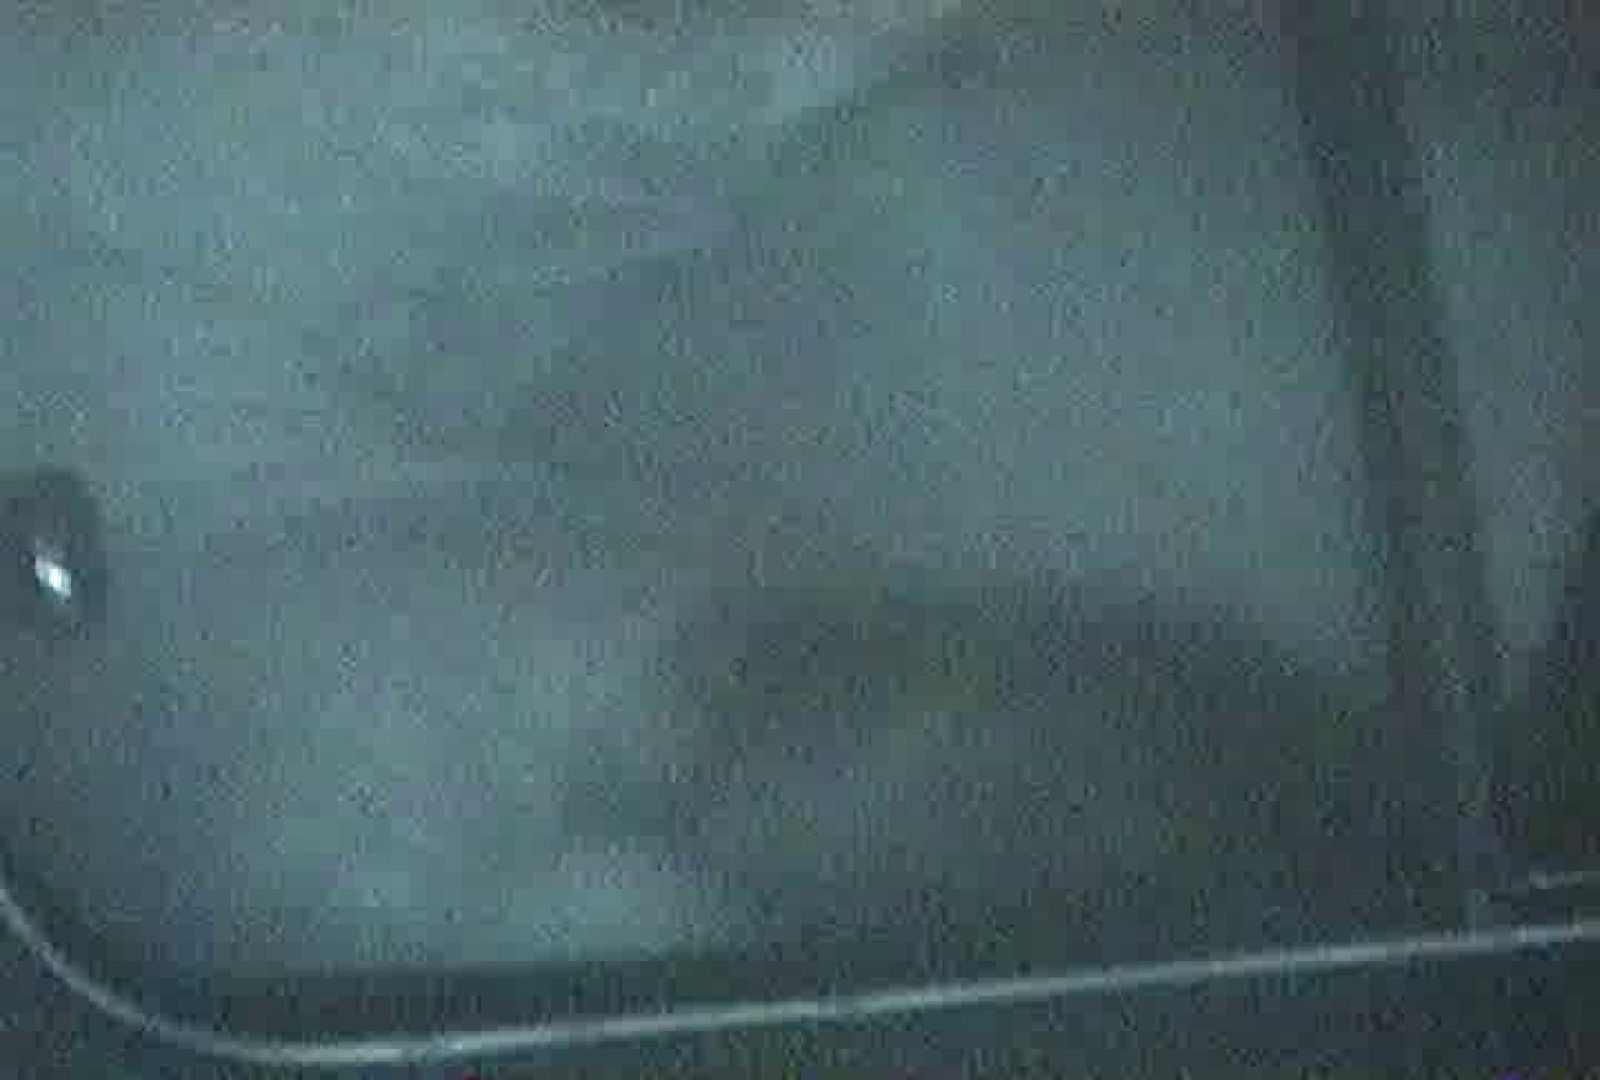 充血監督の深夜の運動会Vol.48 淫乱 スケベ動画紹介 63連発 40